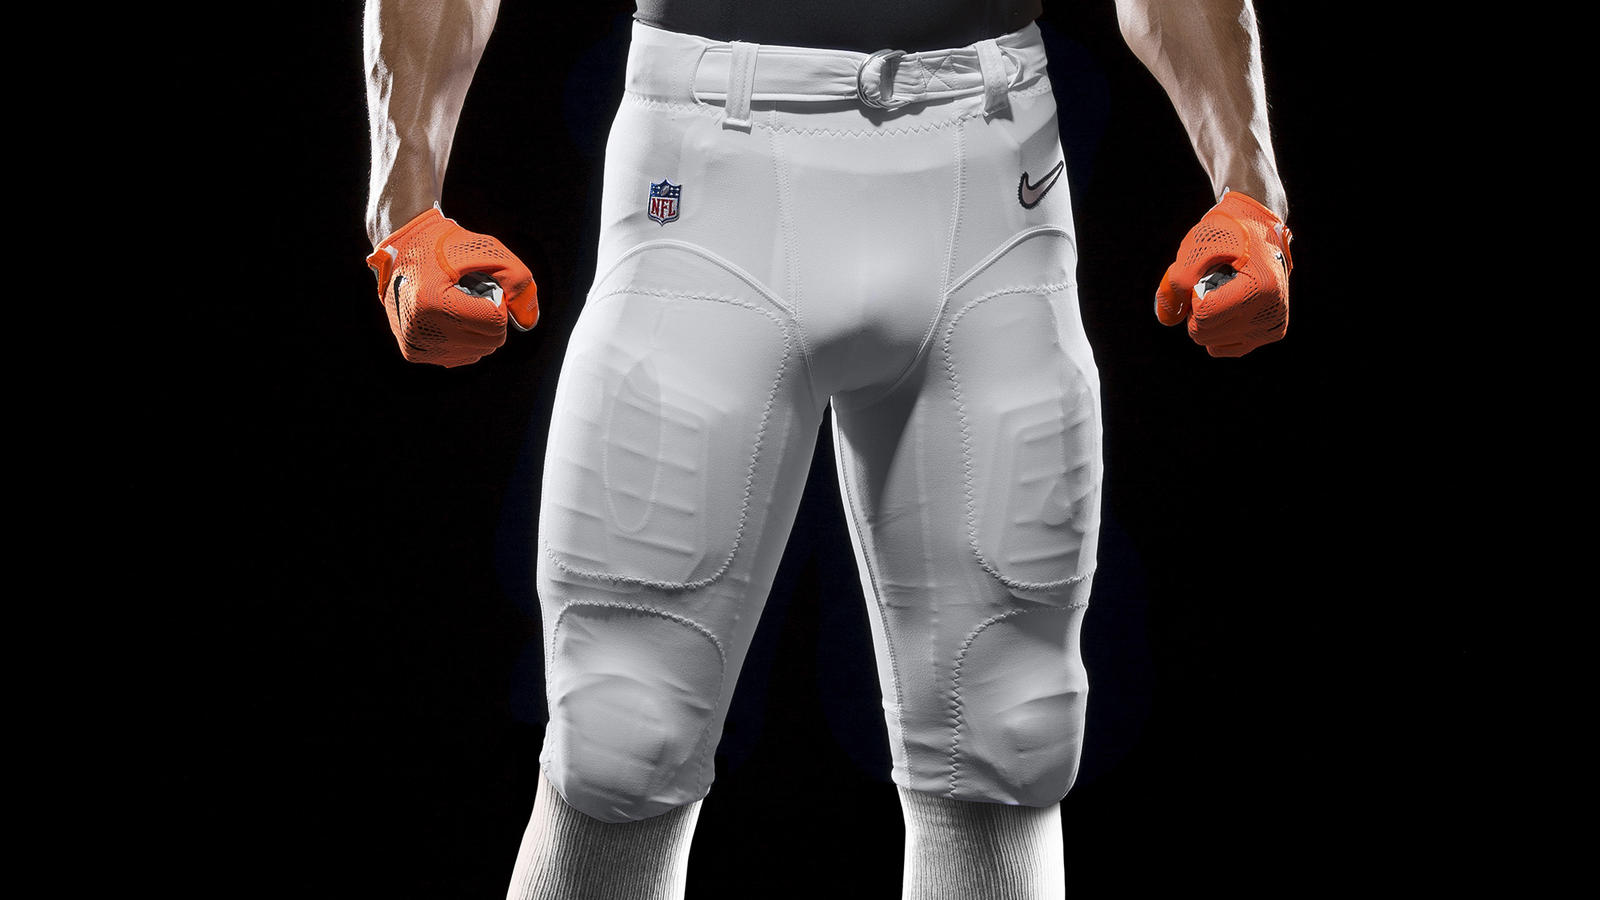 SP14_NFL_SB_TeamUni_NFC_4678_PR_crop_4